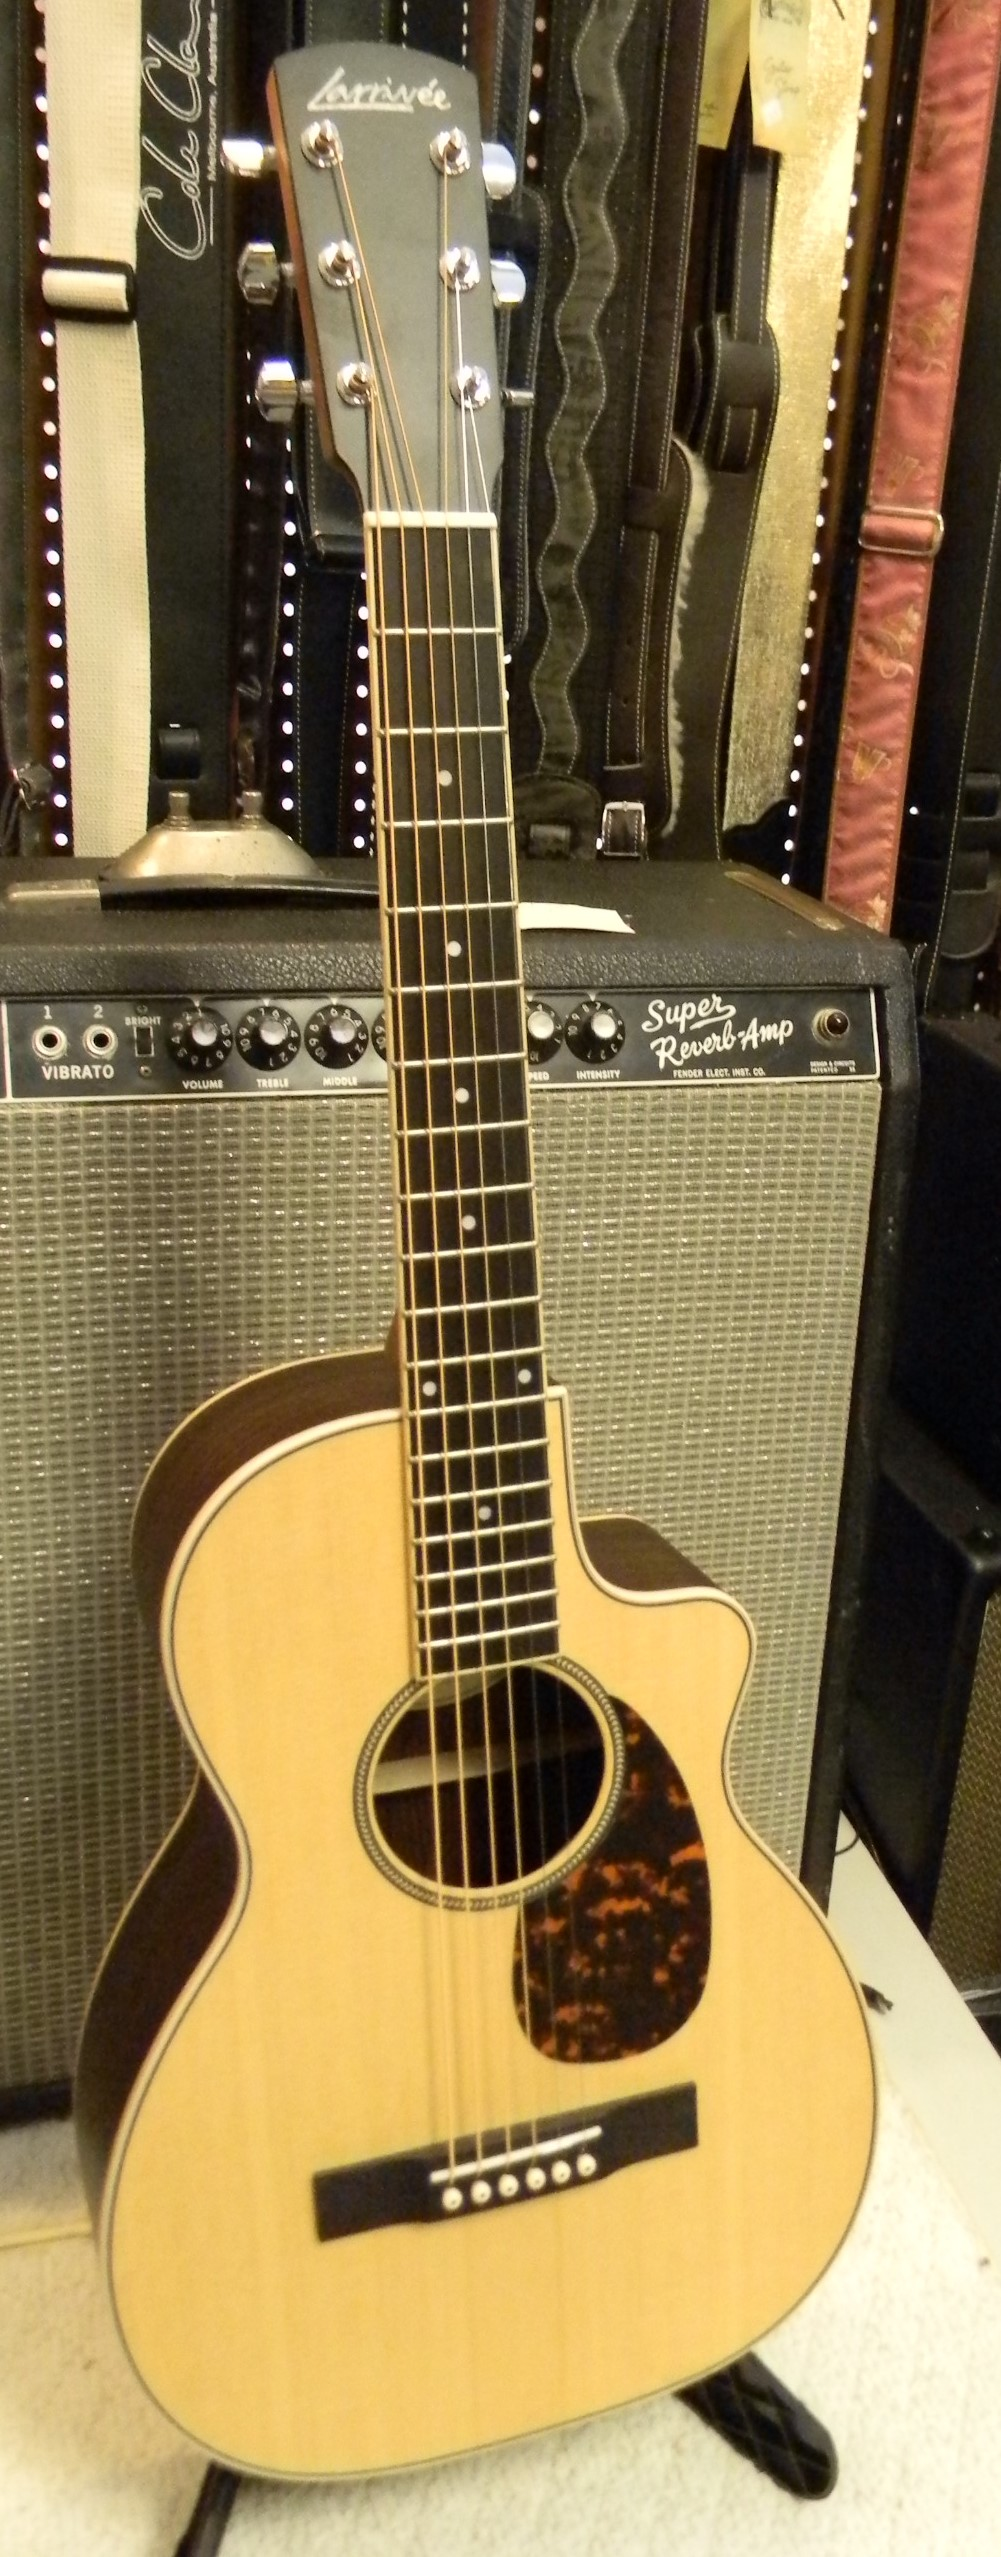 dscn1251 san antonio guitar store guitar tex. Black Bedroom Furniture Sets. Home Design Ideas